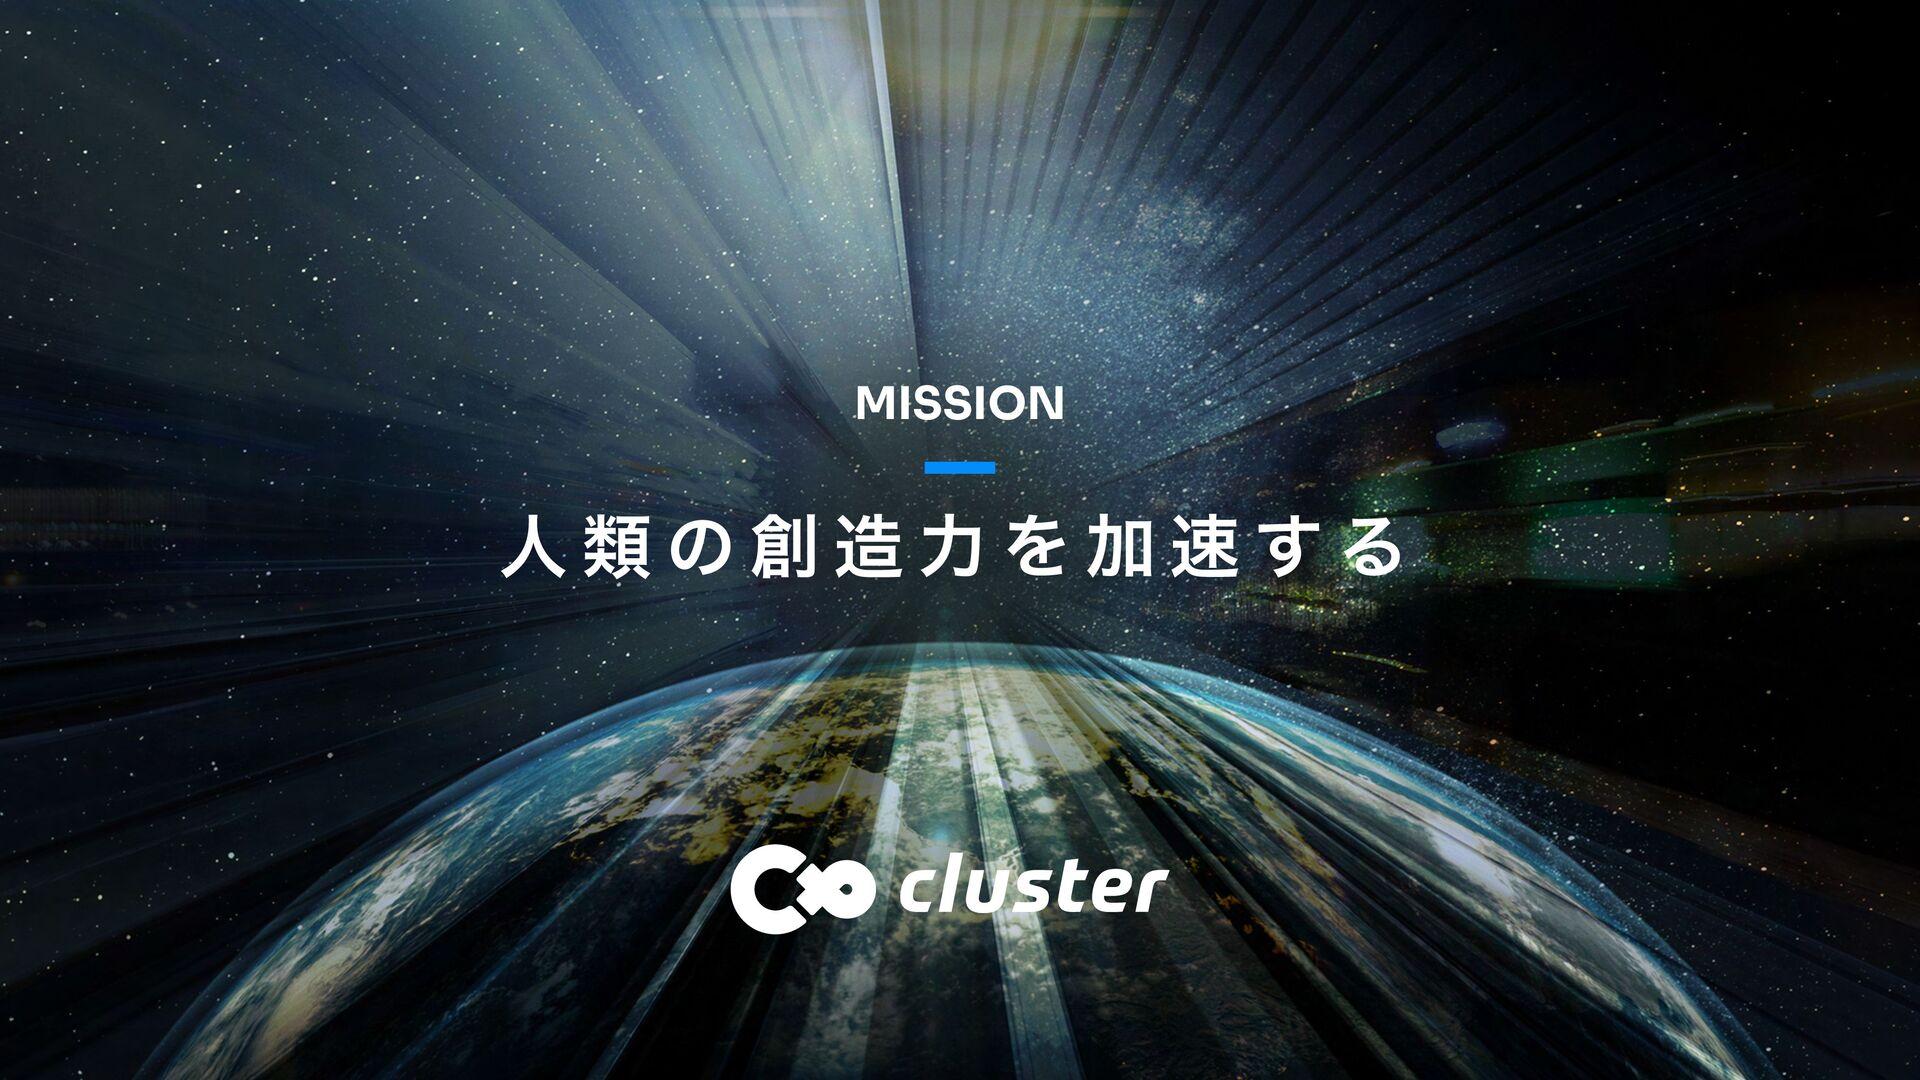 Cluster, Inc. All Rights Reserved. ձࣾ֓ཁ 5 ਓ ྨ ͷ...